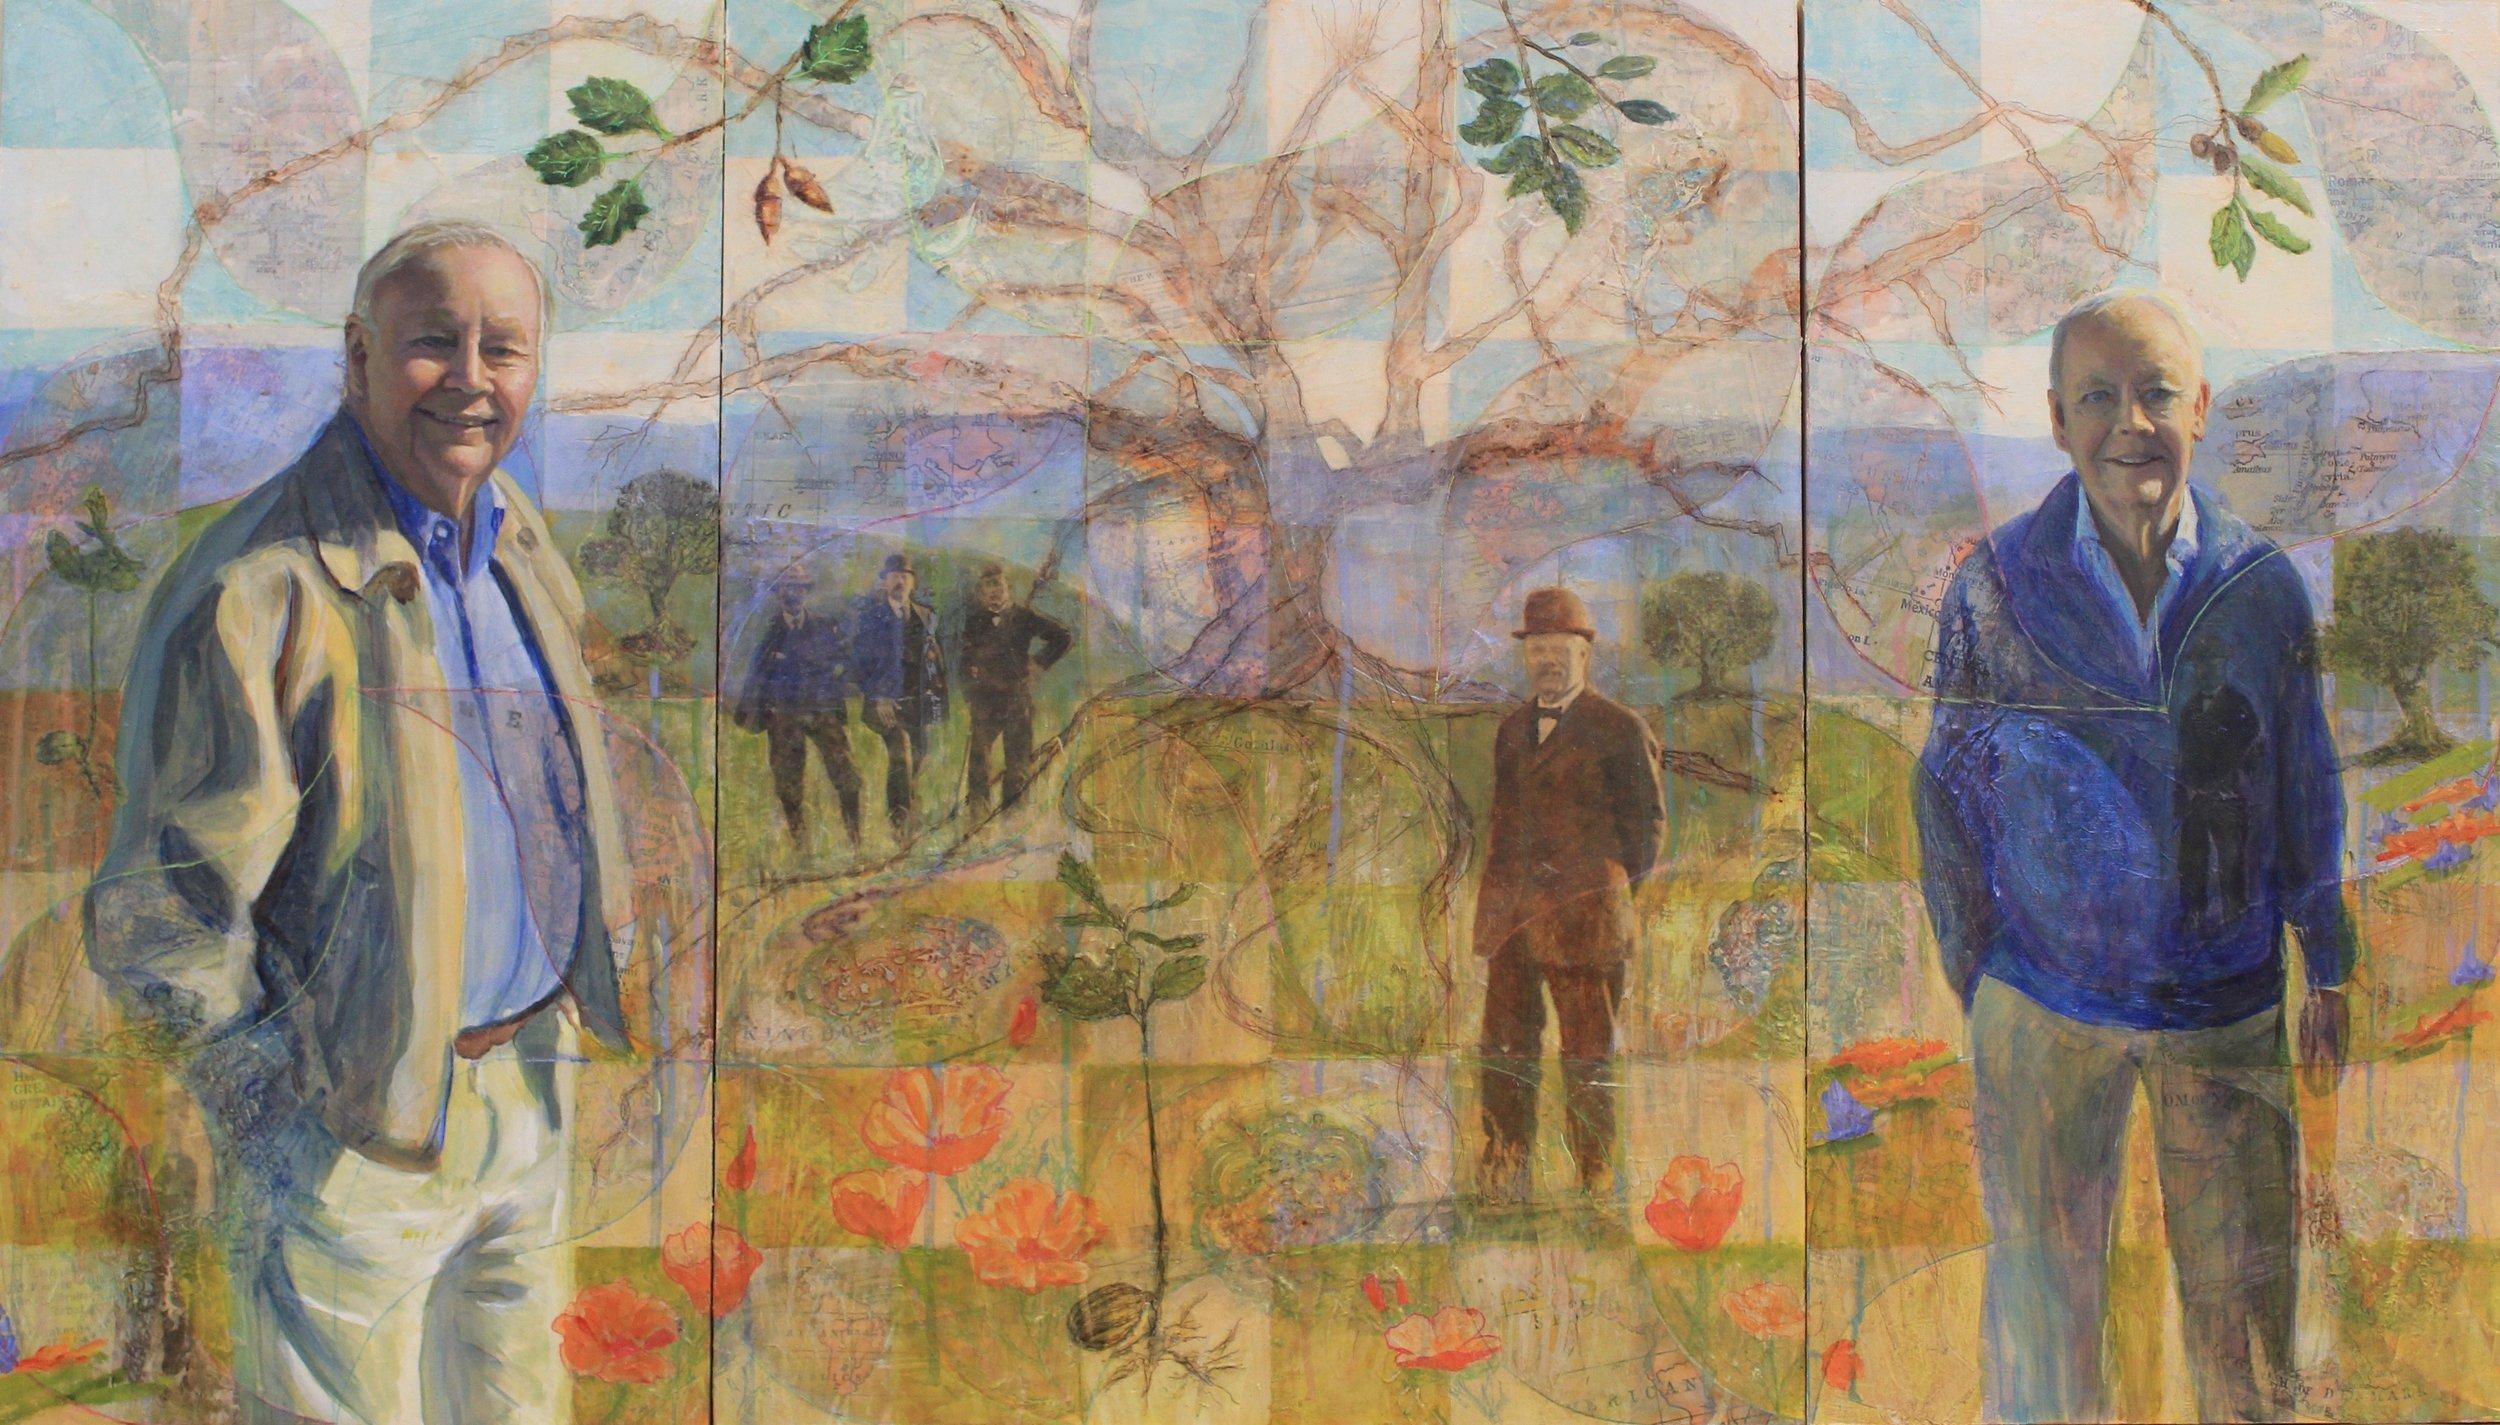 Erik and Hans Gregersen, multimedia tryptich, 12x24, 18x24, 12x24, by Holli Harmon